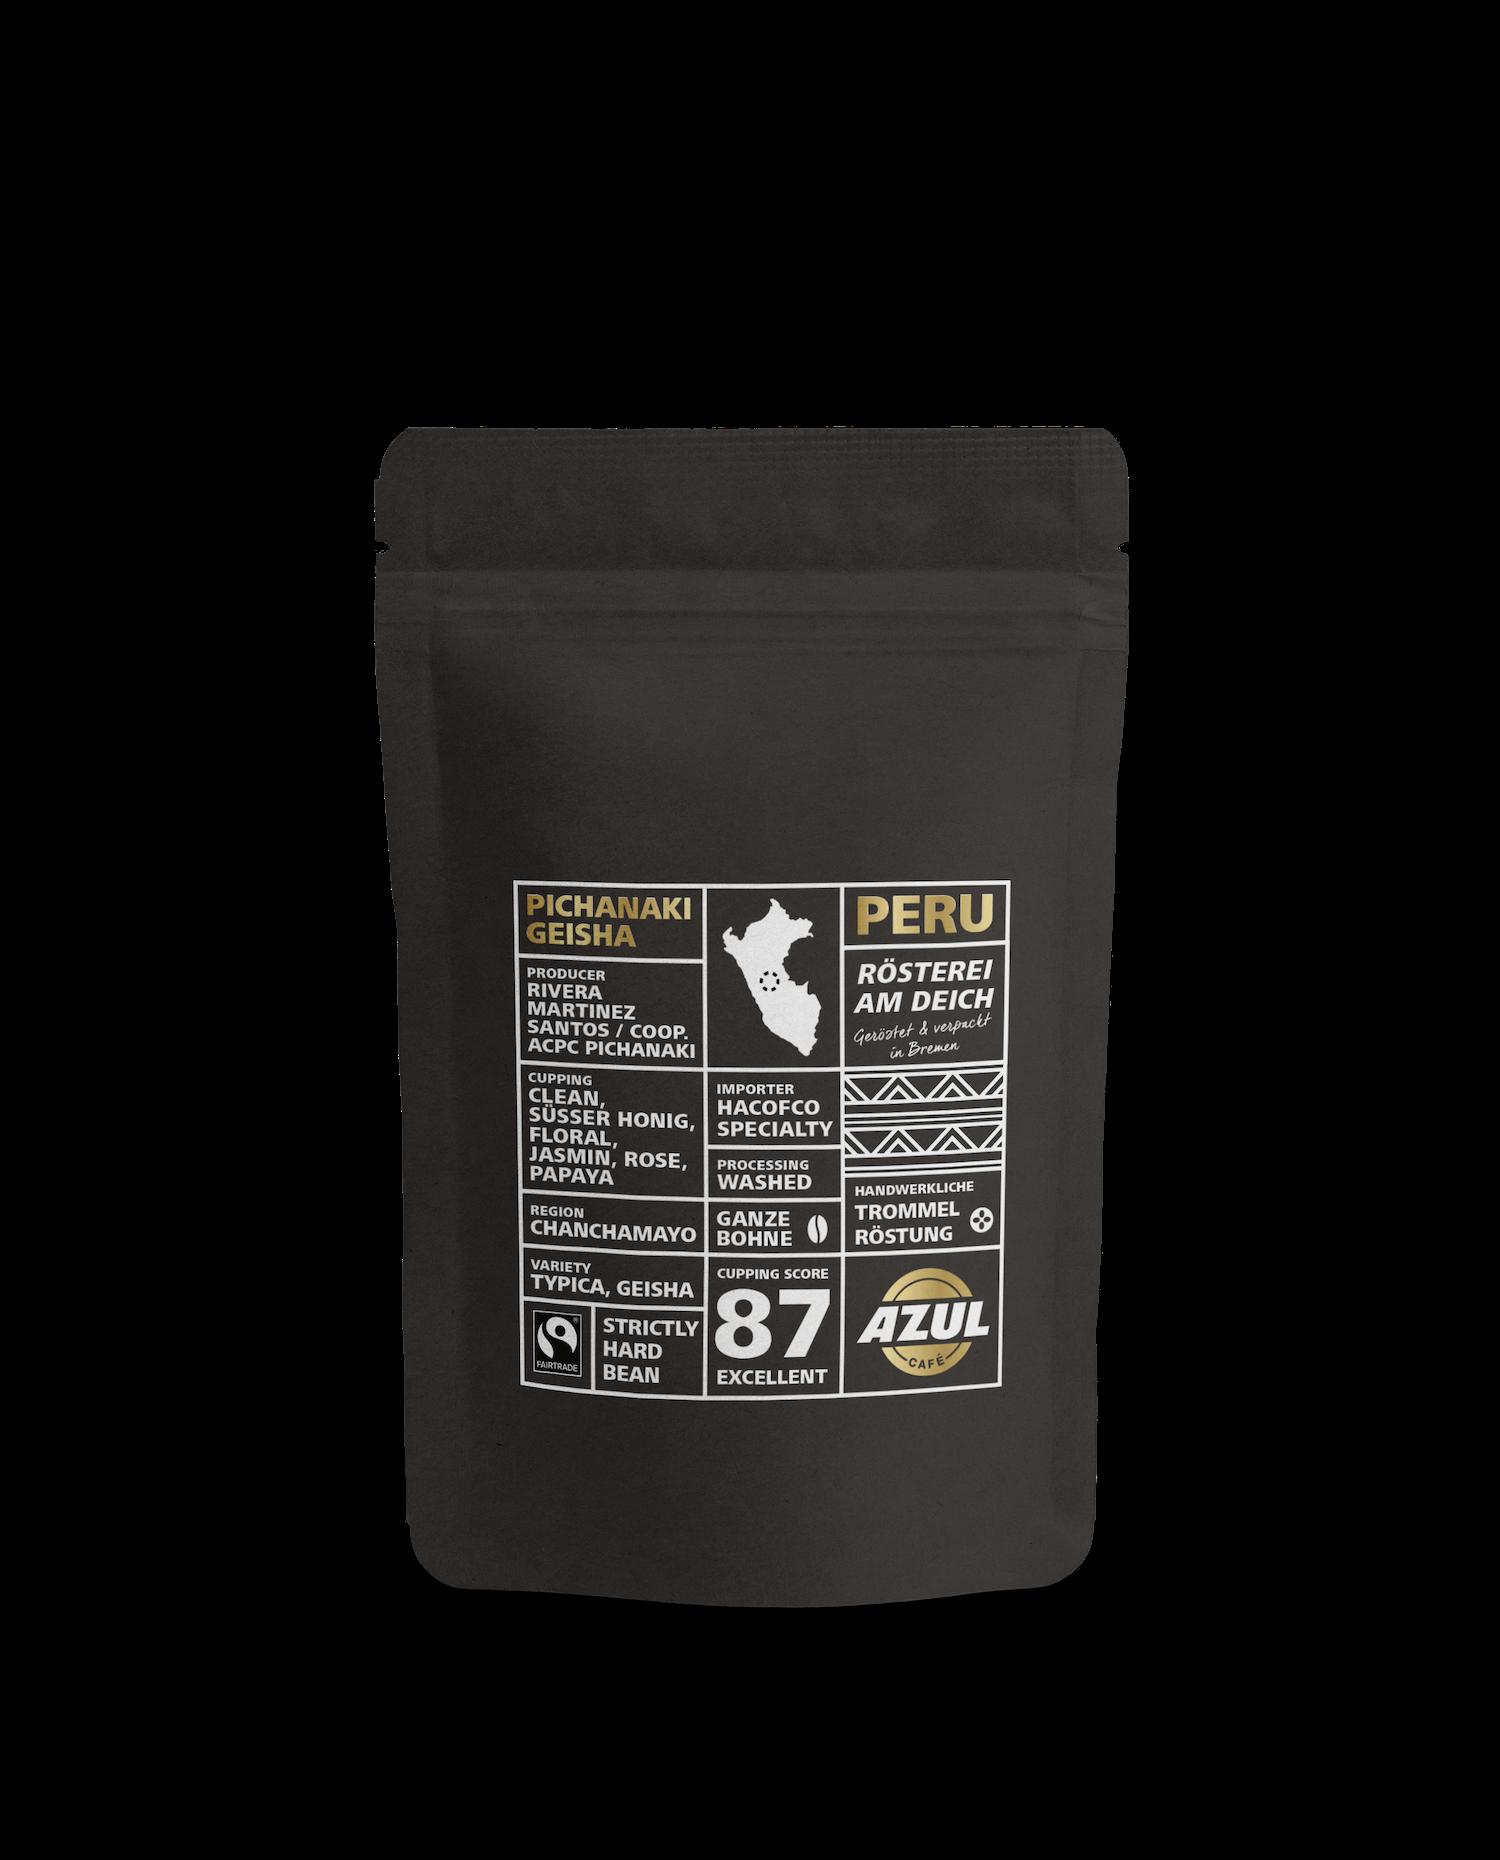 Azul Kaffee – Specialty Coffee Peru Pichanaki Geisha Fairtrade